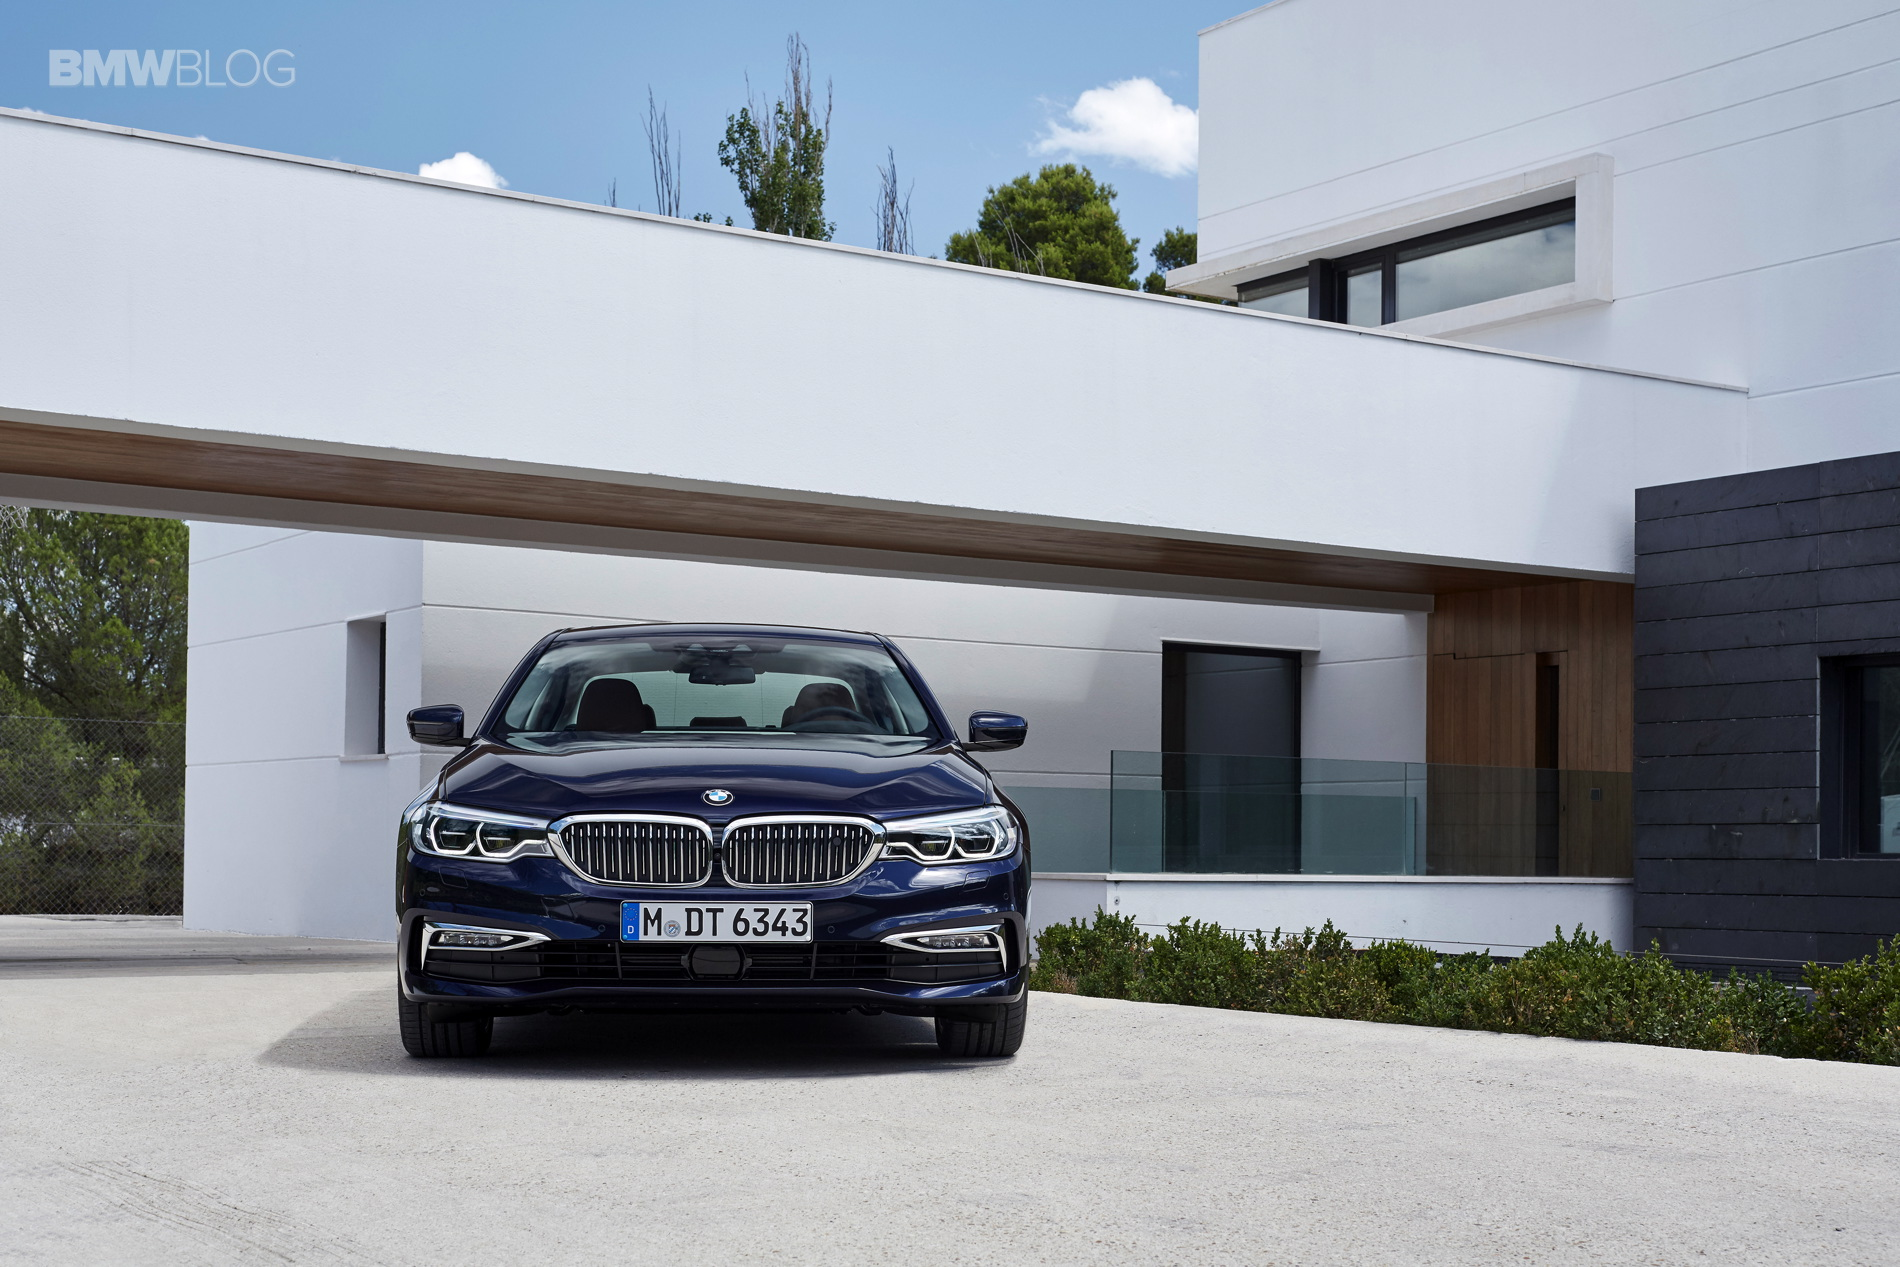 BMW G30 5 Series Luxury Line exterior 20